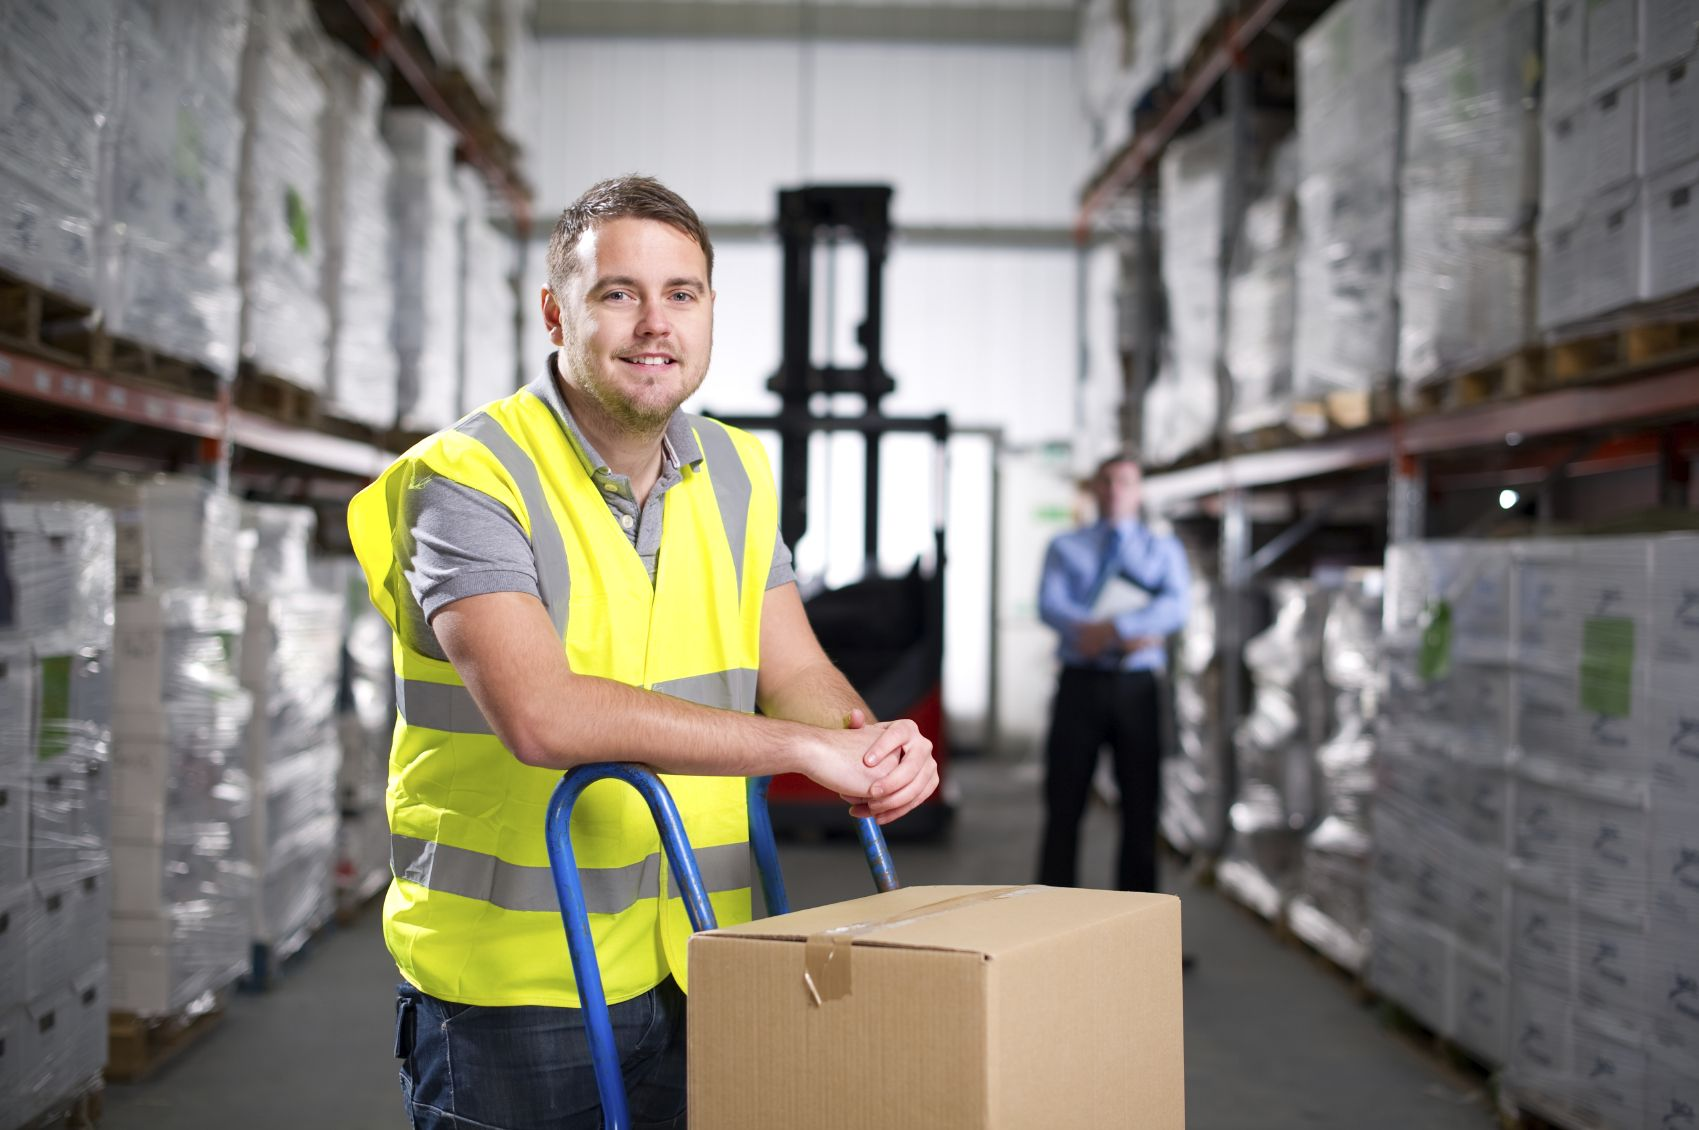 Работа в Англия / Позиция: Складови работници